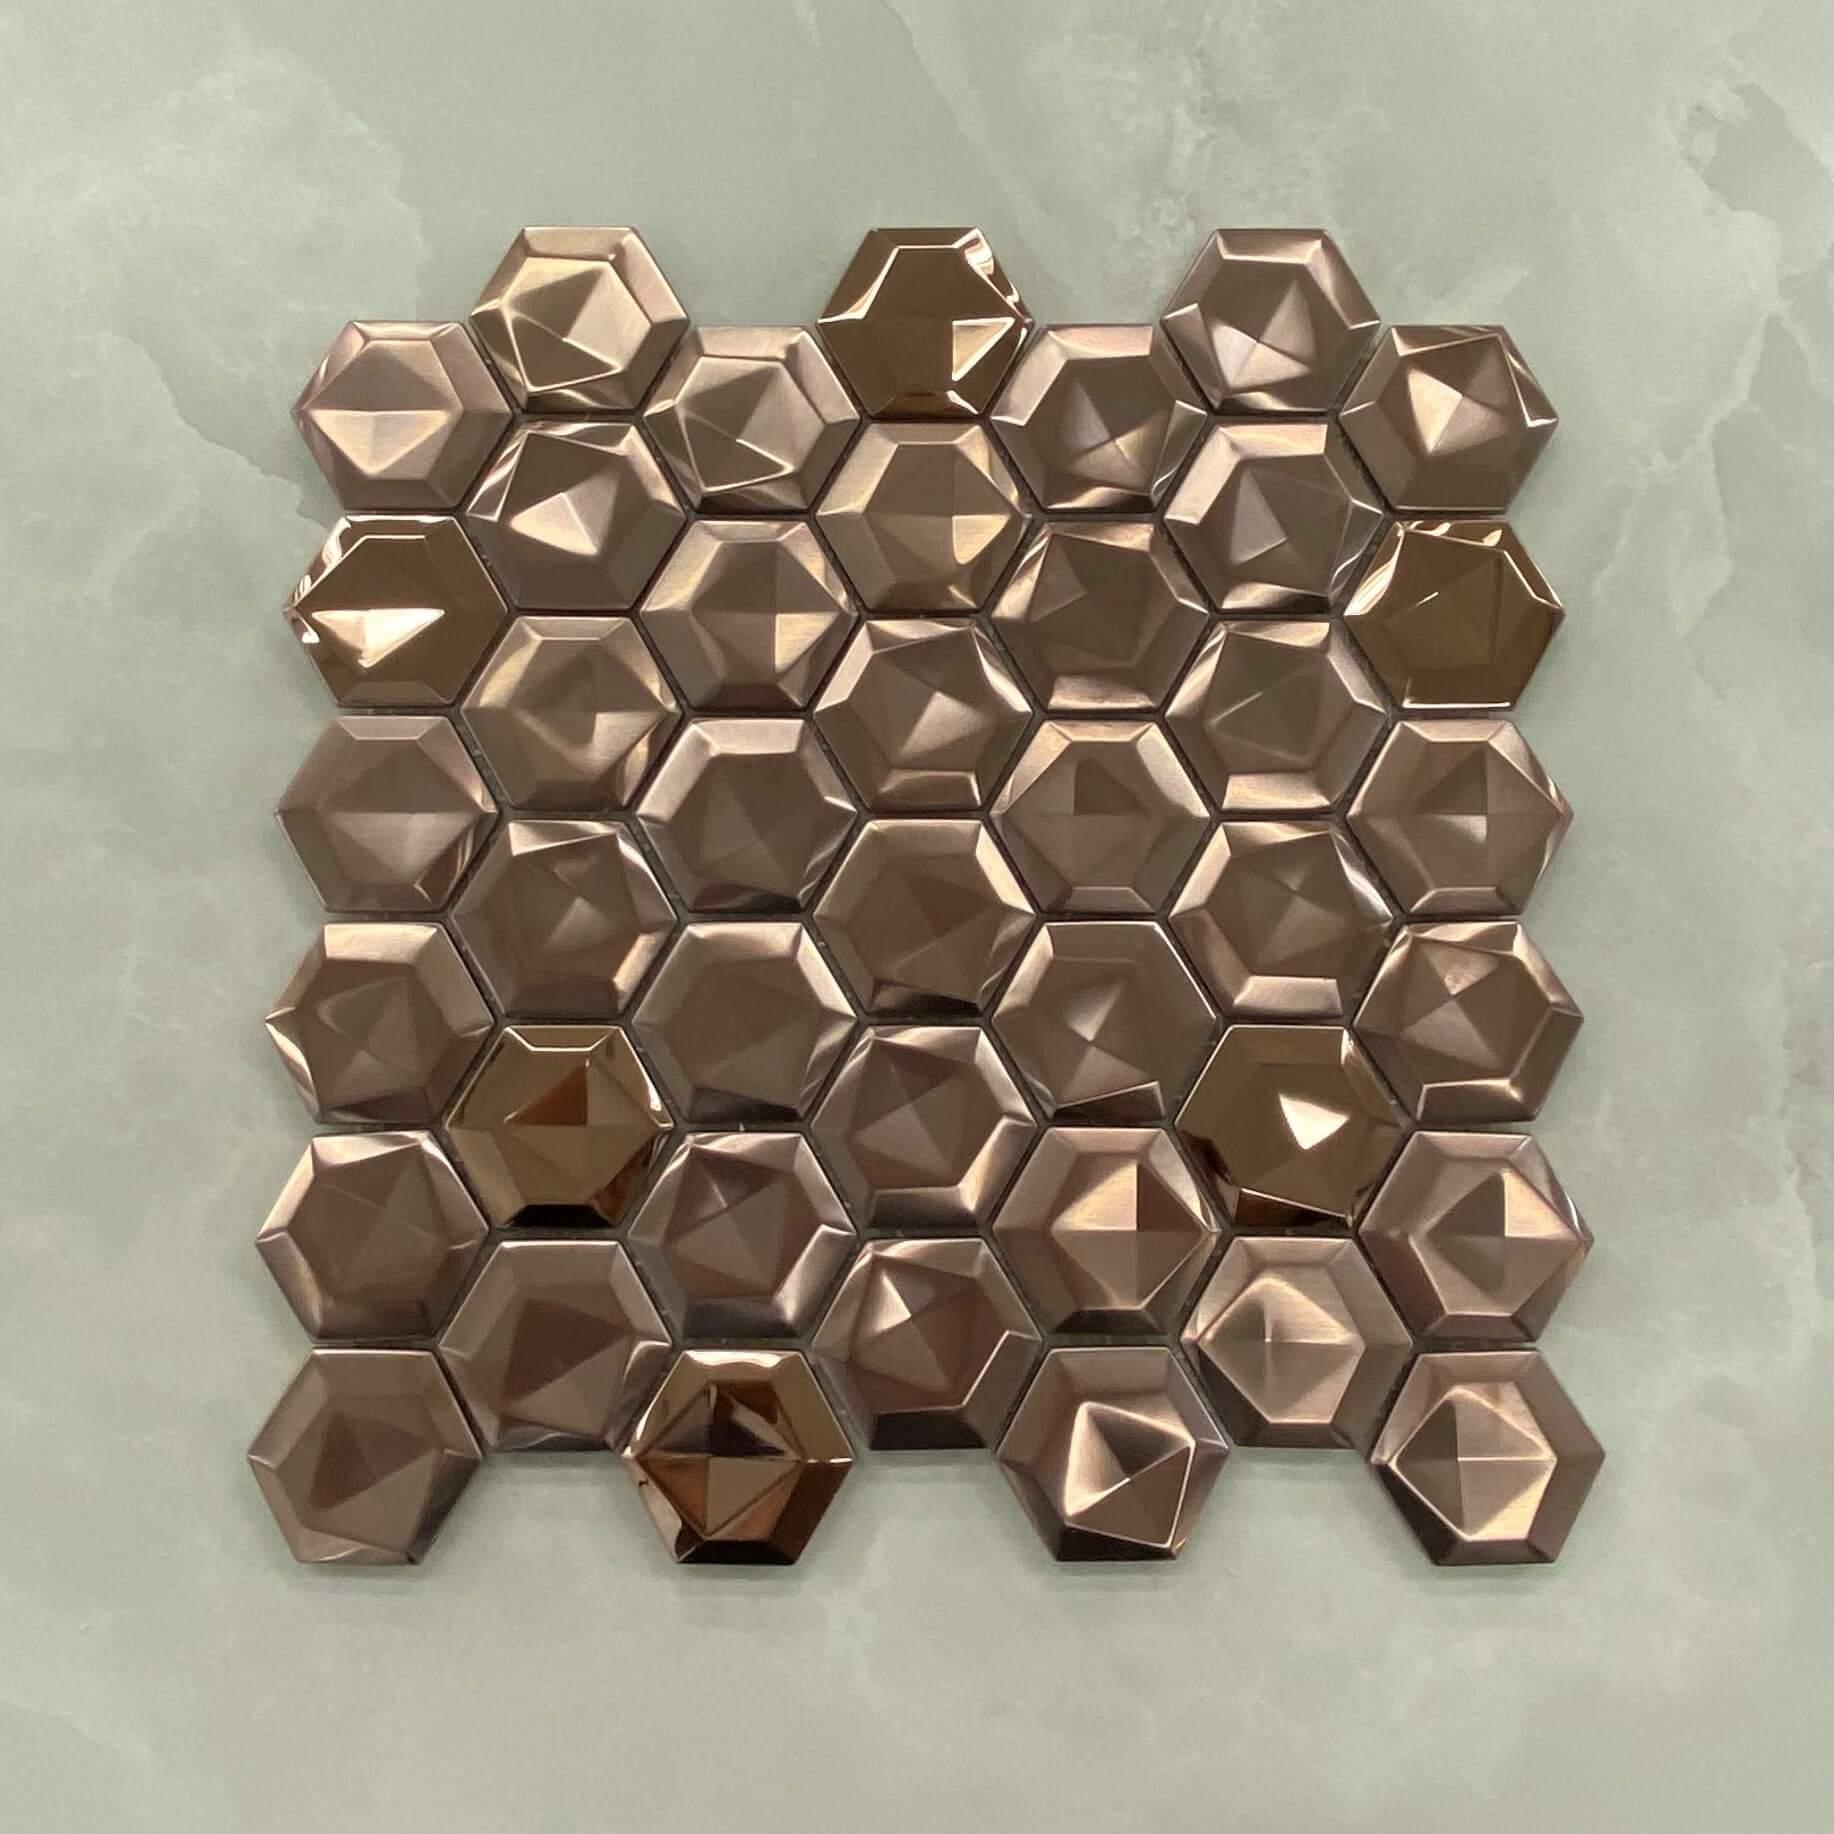 298x300mm 3D Effect Hexagon Stainless Steel Rose Gold Mosaic 7574